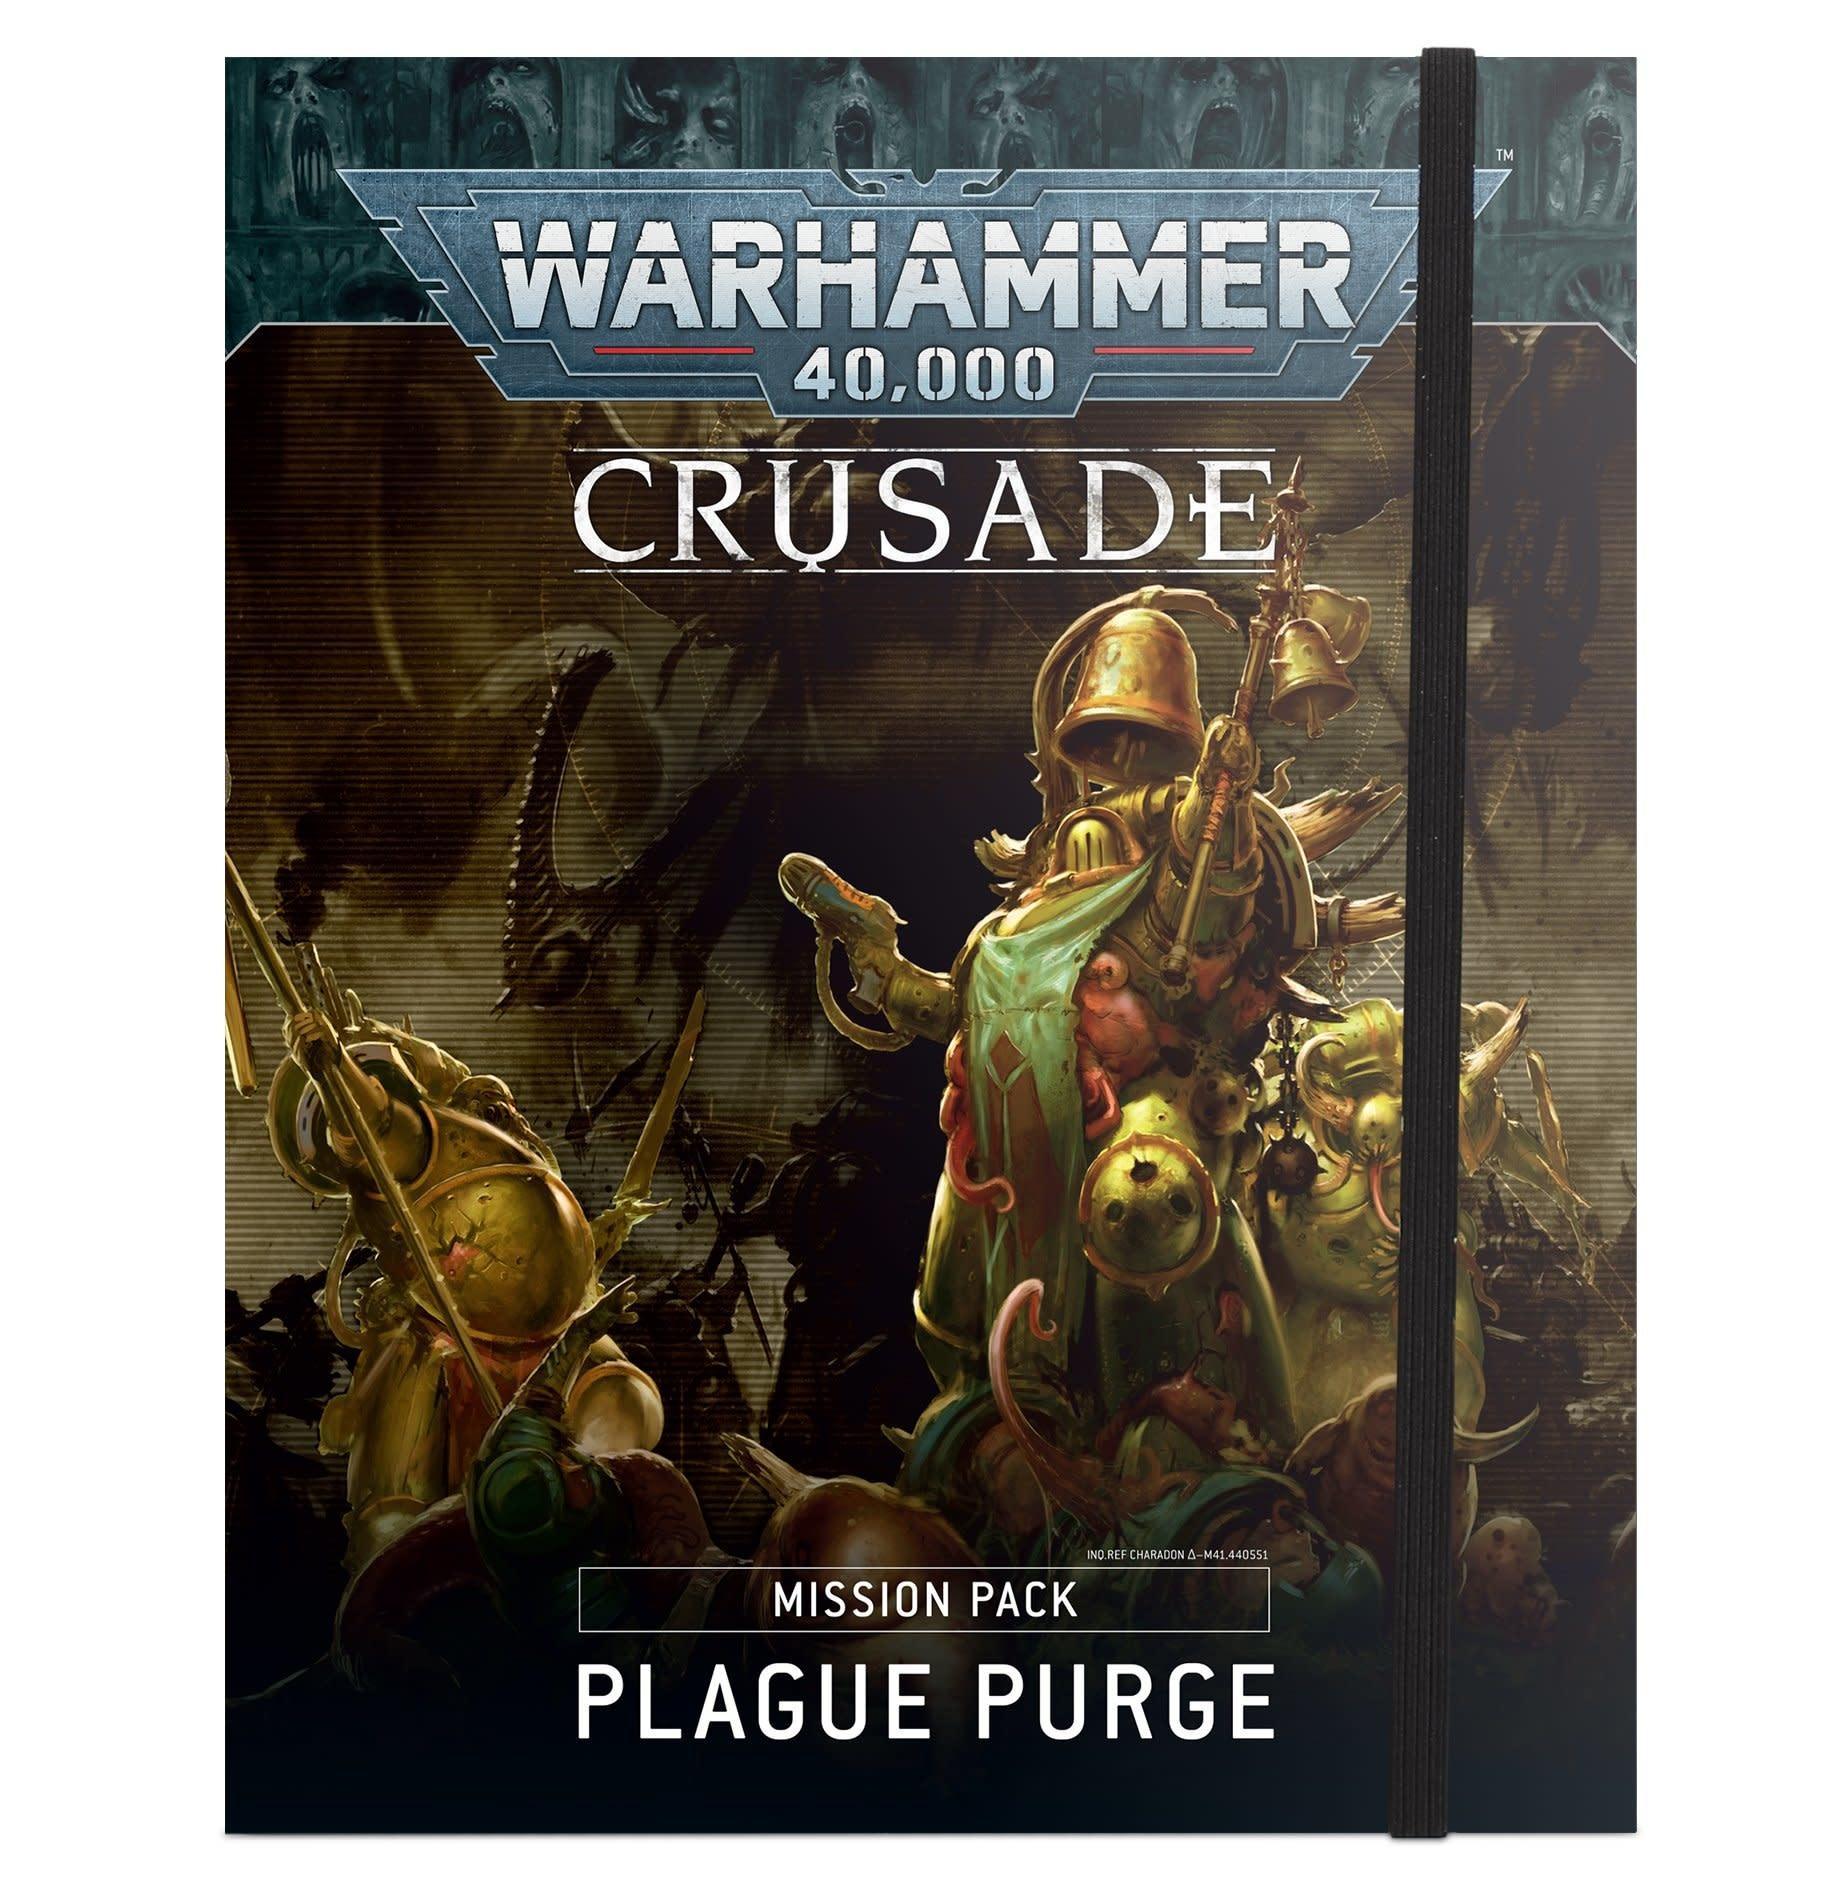 Crusade Mission Pack: Plague Purge (EN)